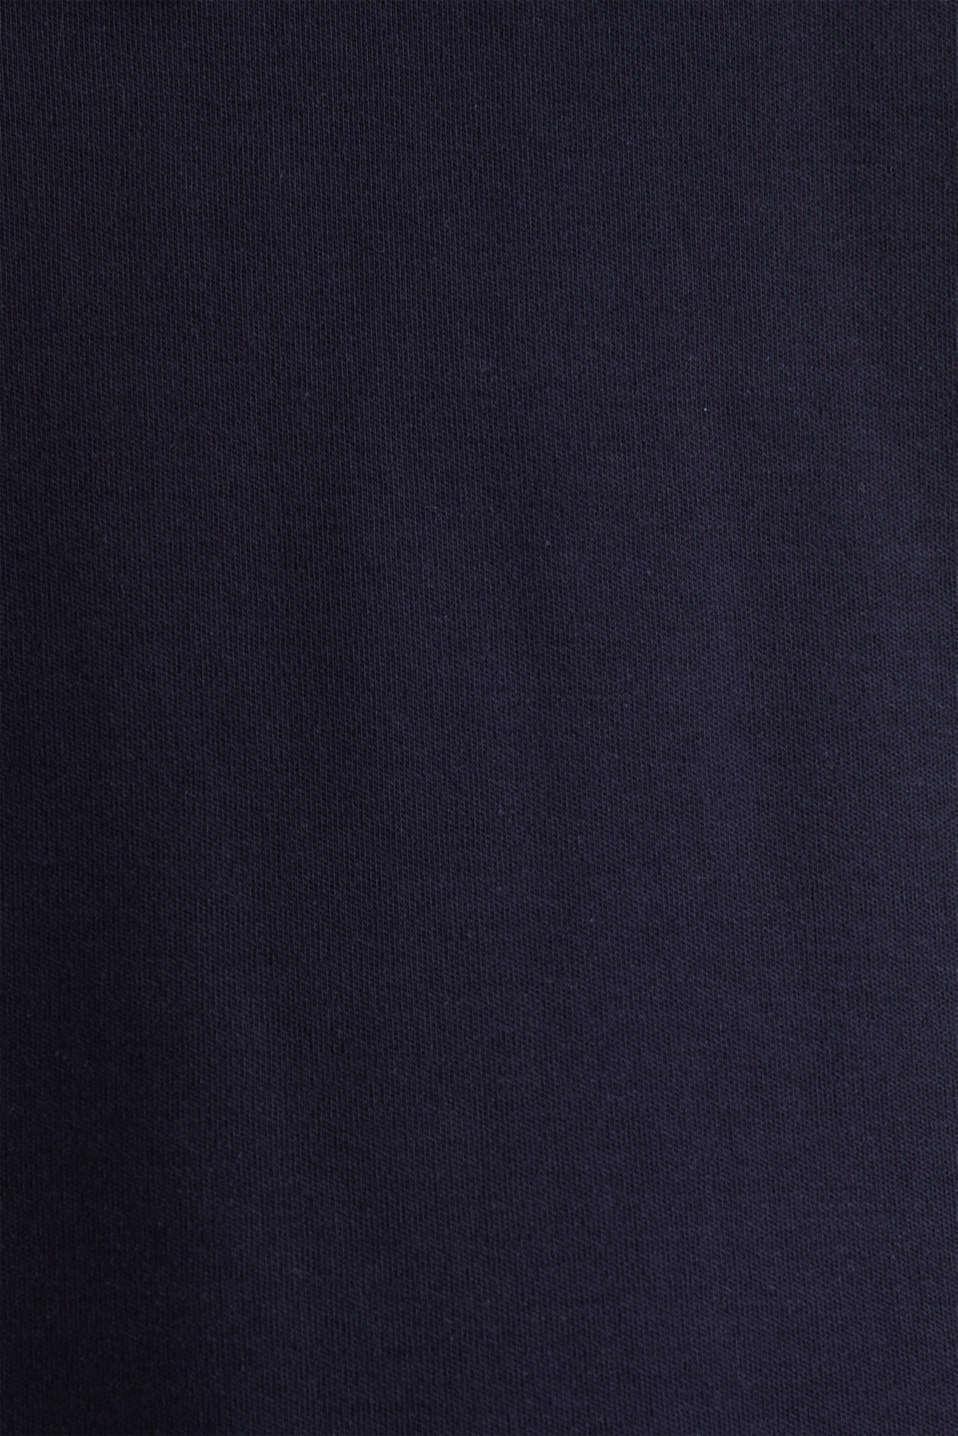 Hooded sweatshirt fabric dress, NAVY, detail image number 5